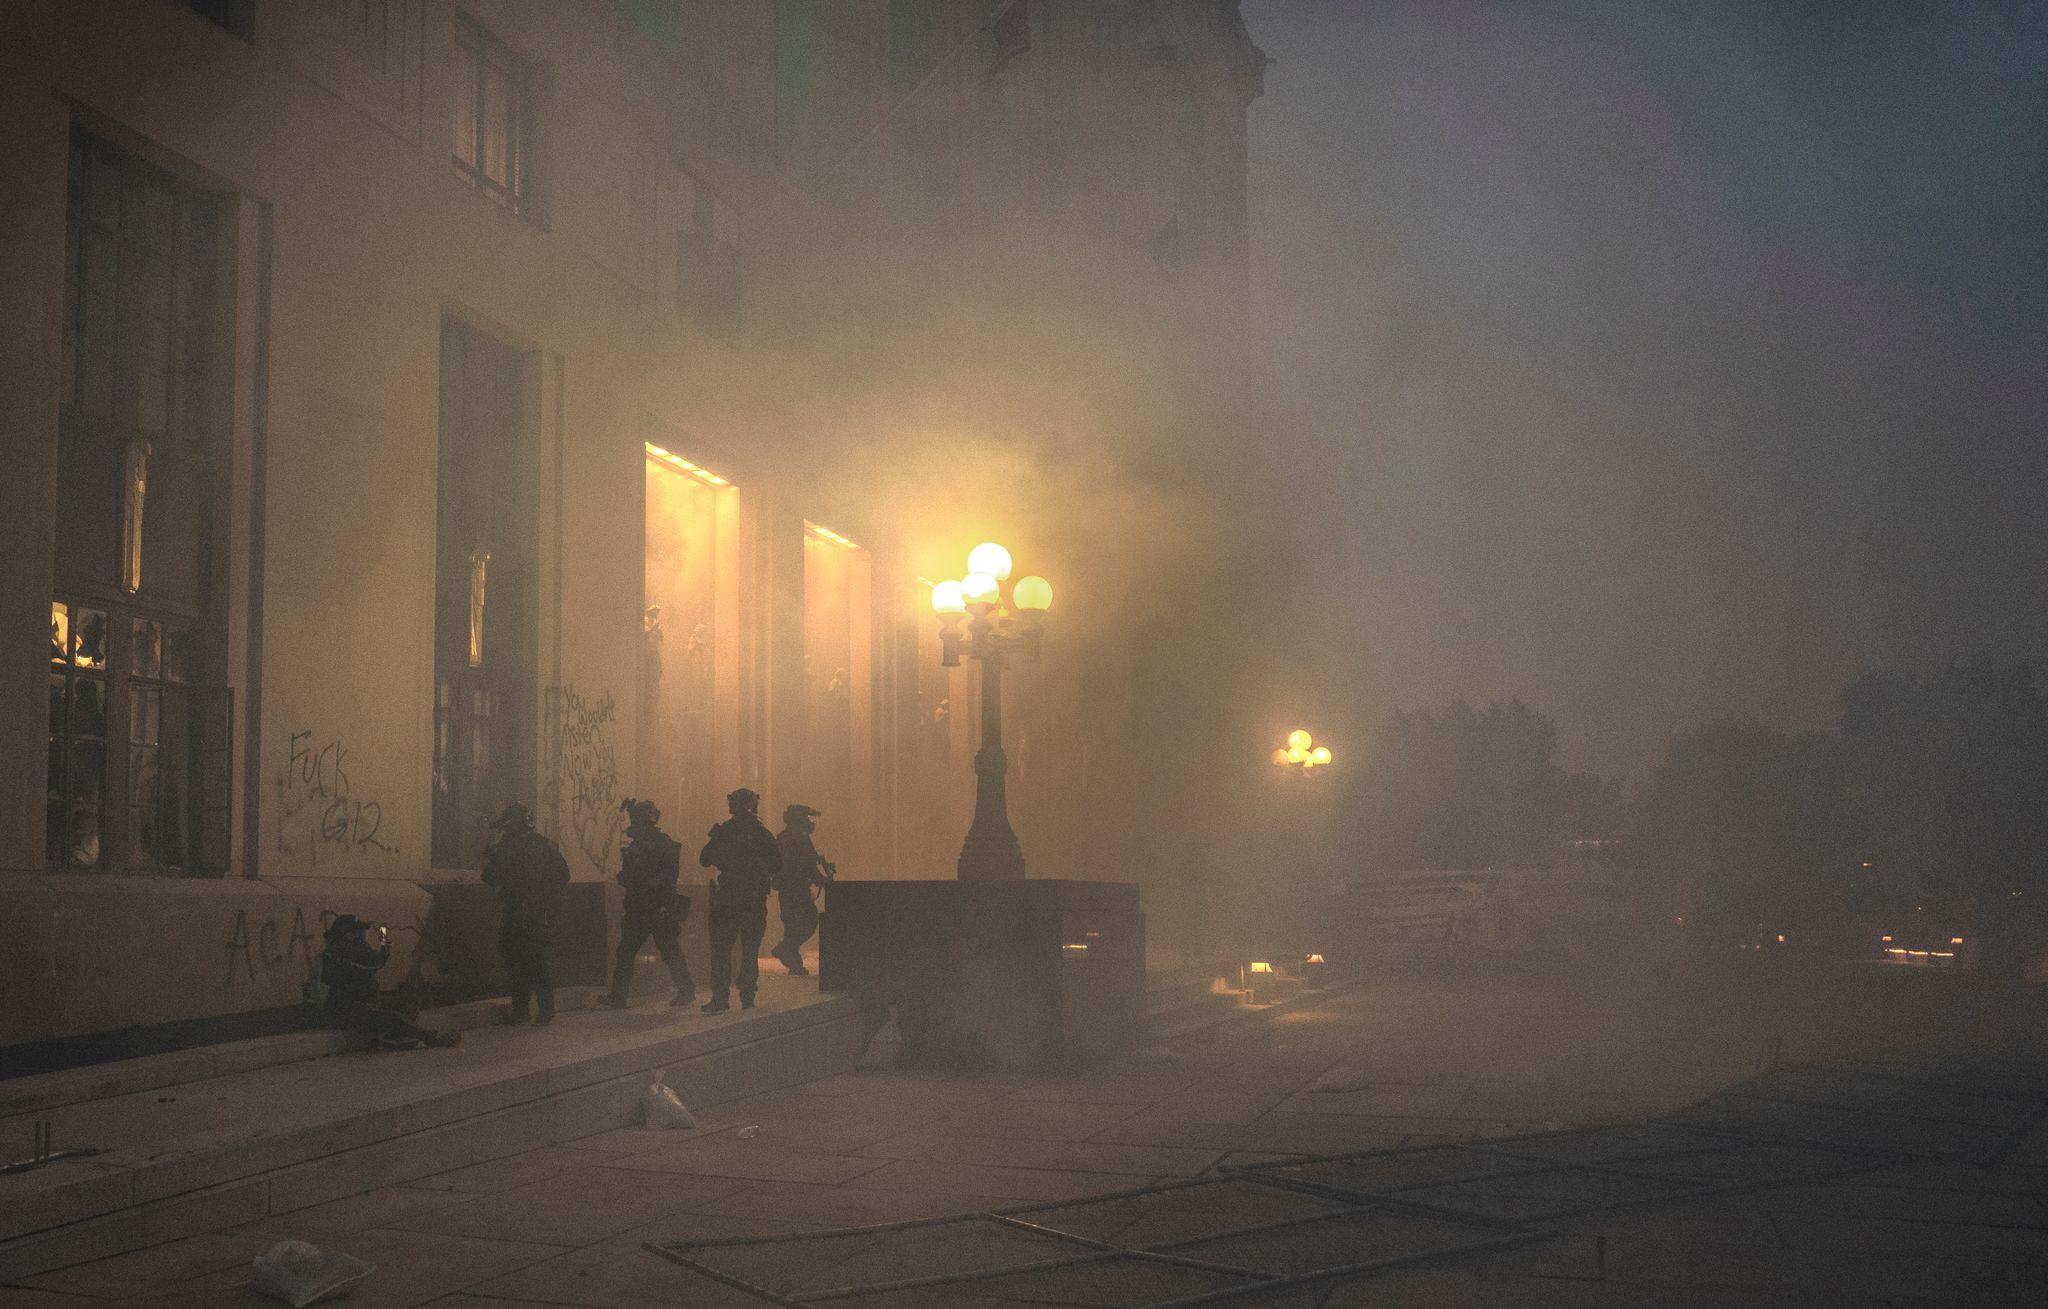 Nashville, Tenn. - Metro Nashville Police deploy tear gas outside Historic Metro Nashville Courthouse to disperse the crowd. (Photo: John Partipilo)